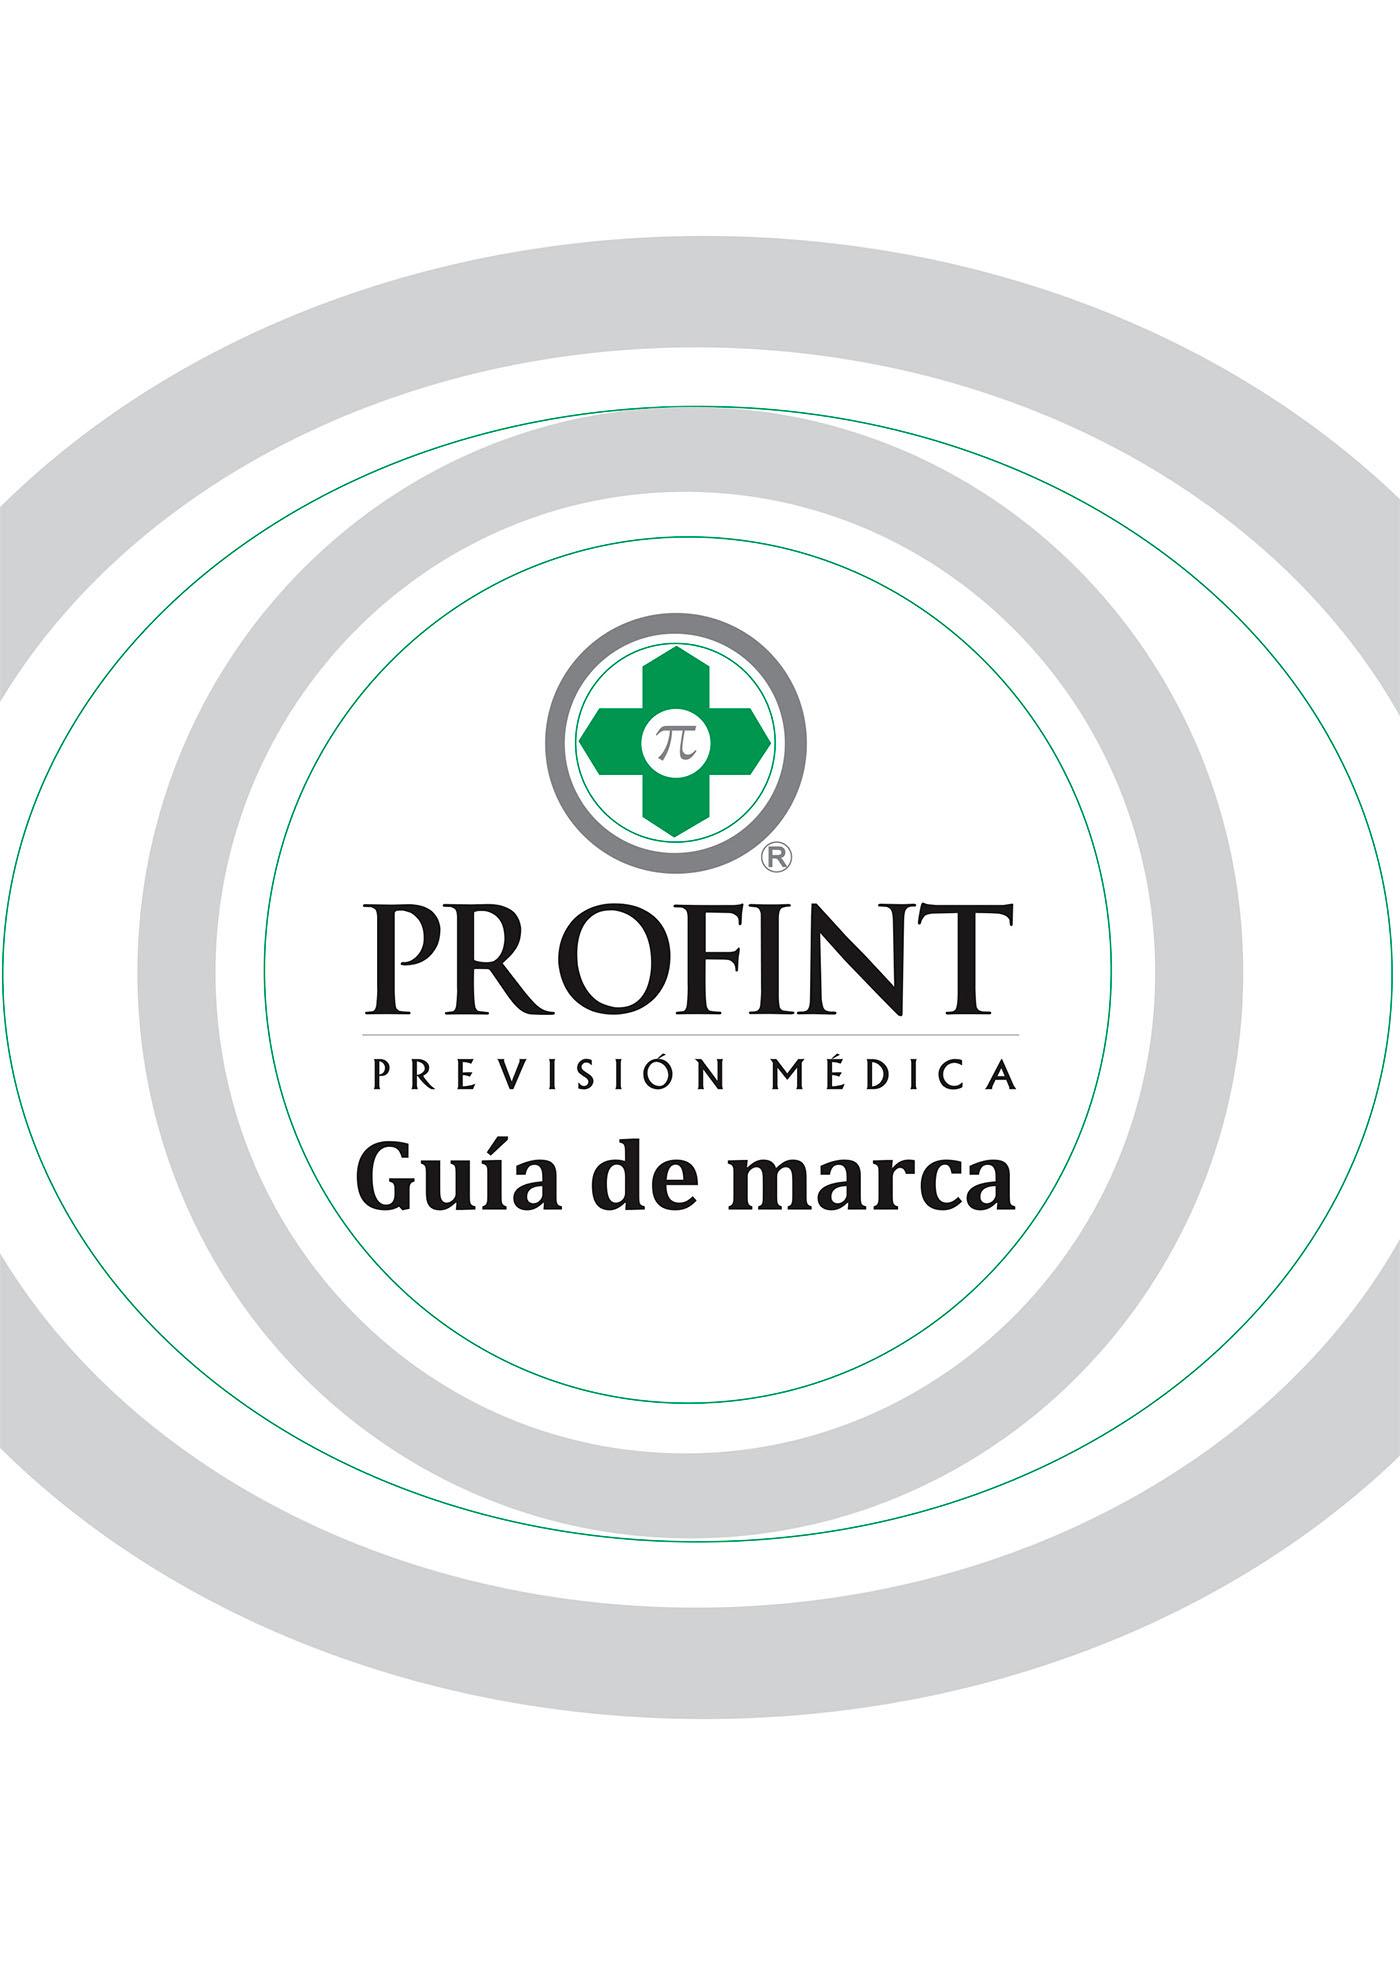 Manual de Marca Profint on Behance